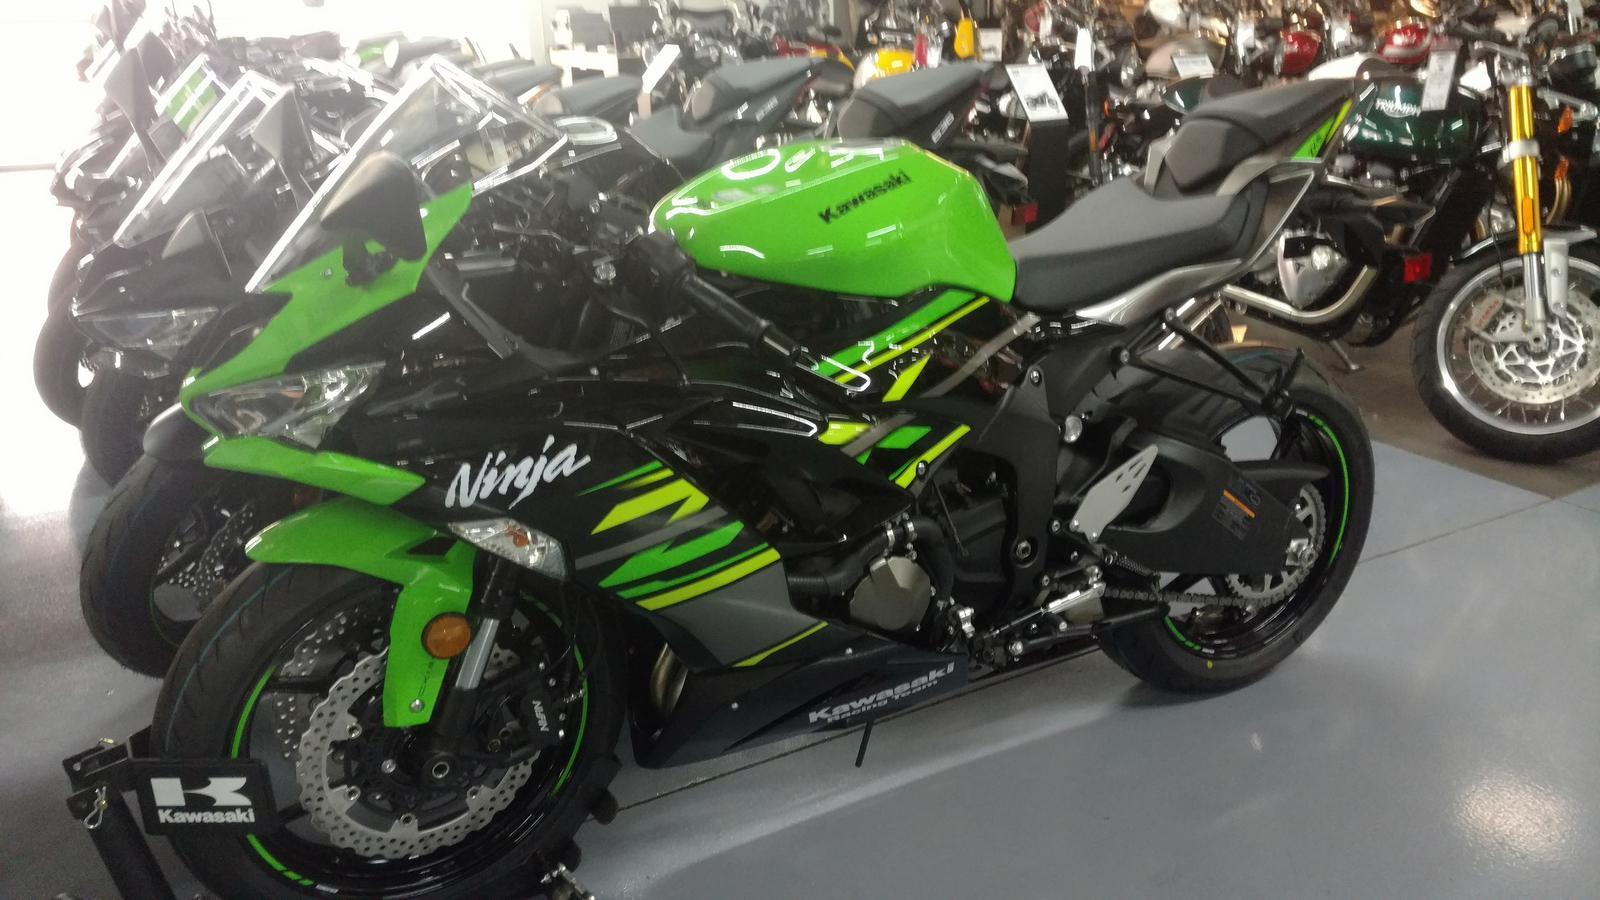 2019 Kawasaki Ninja ZX-6R ABS KRT Edition